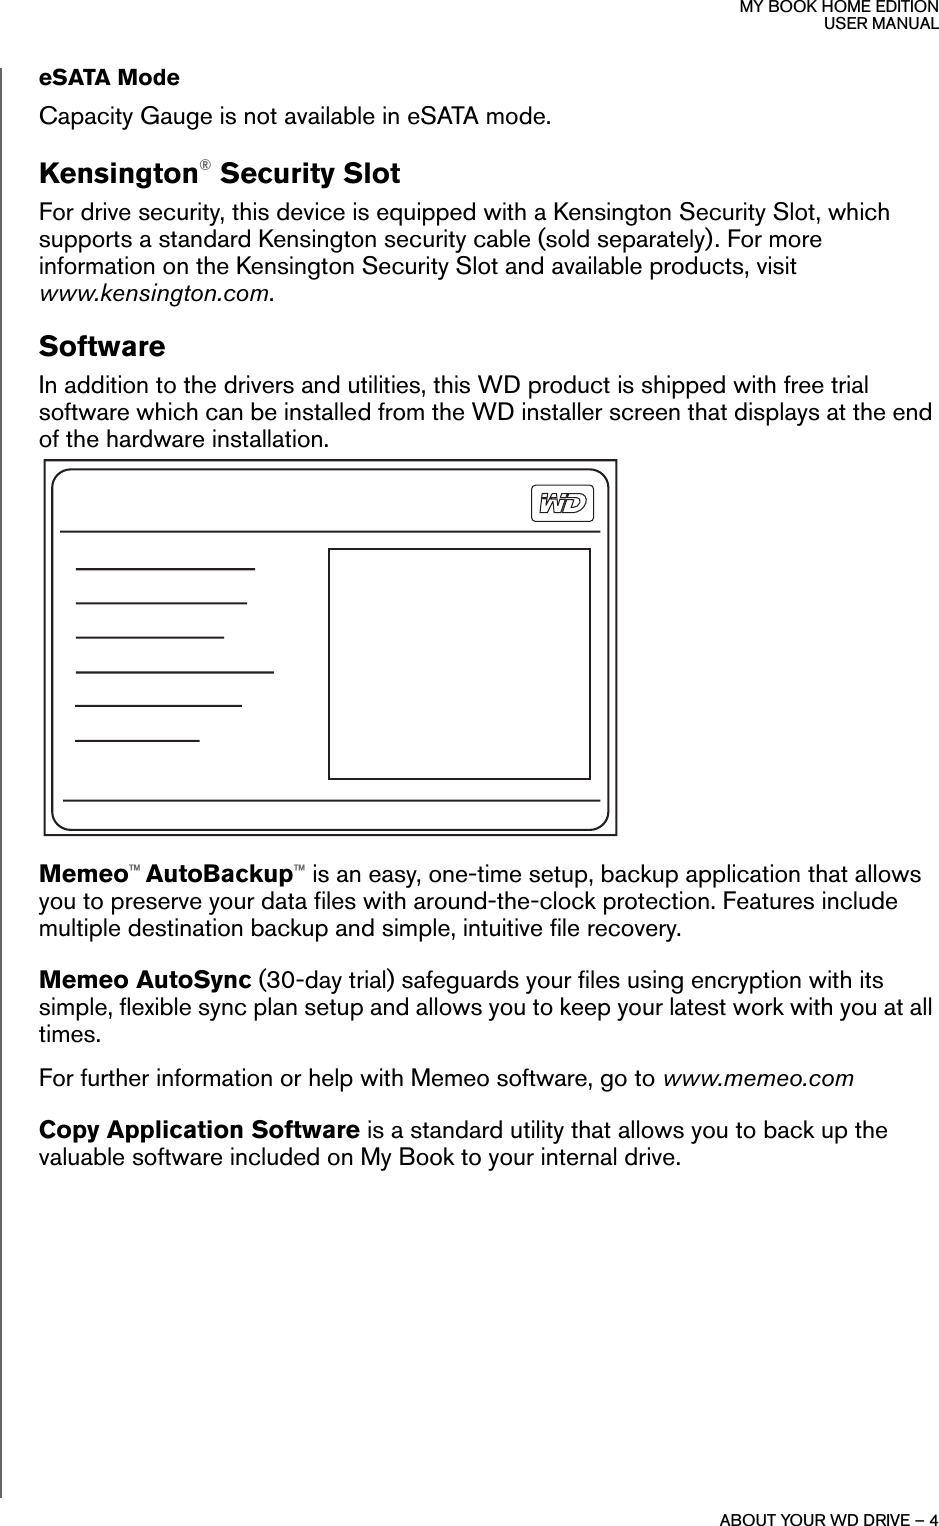 Western Digital Wd10000H1U 00 Users Manual 820173 My Book